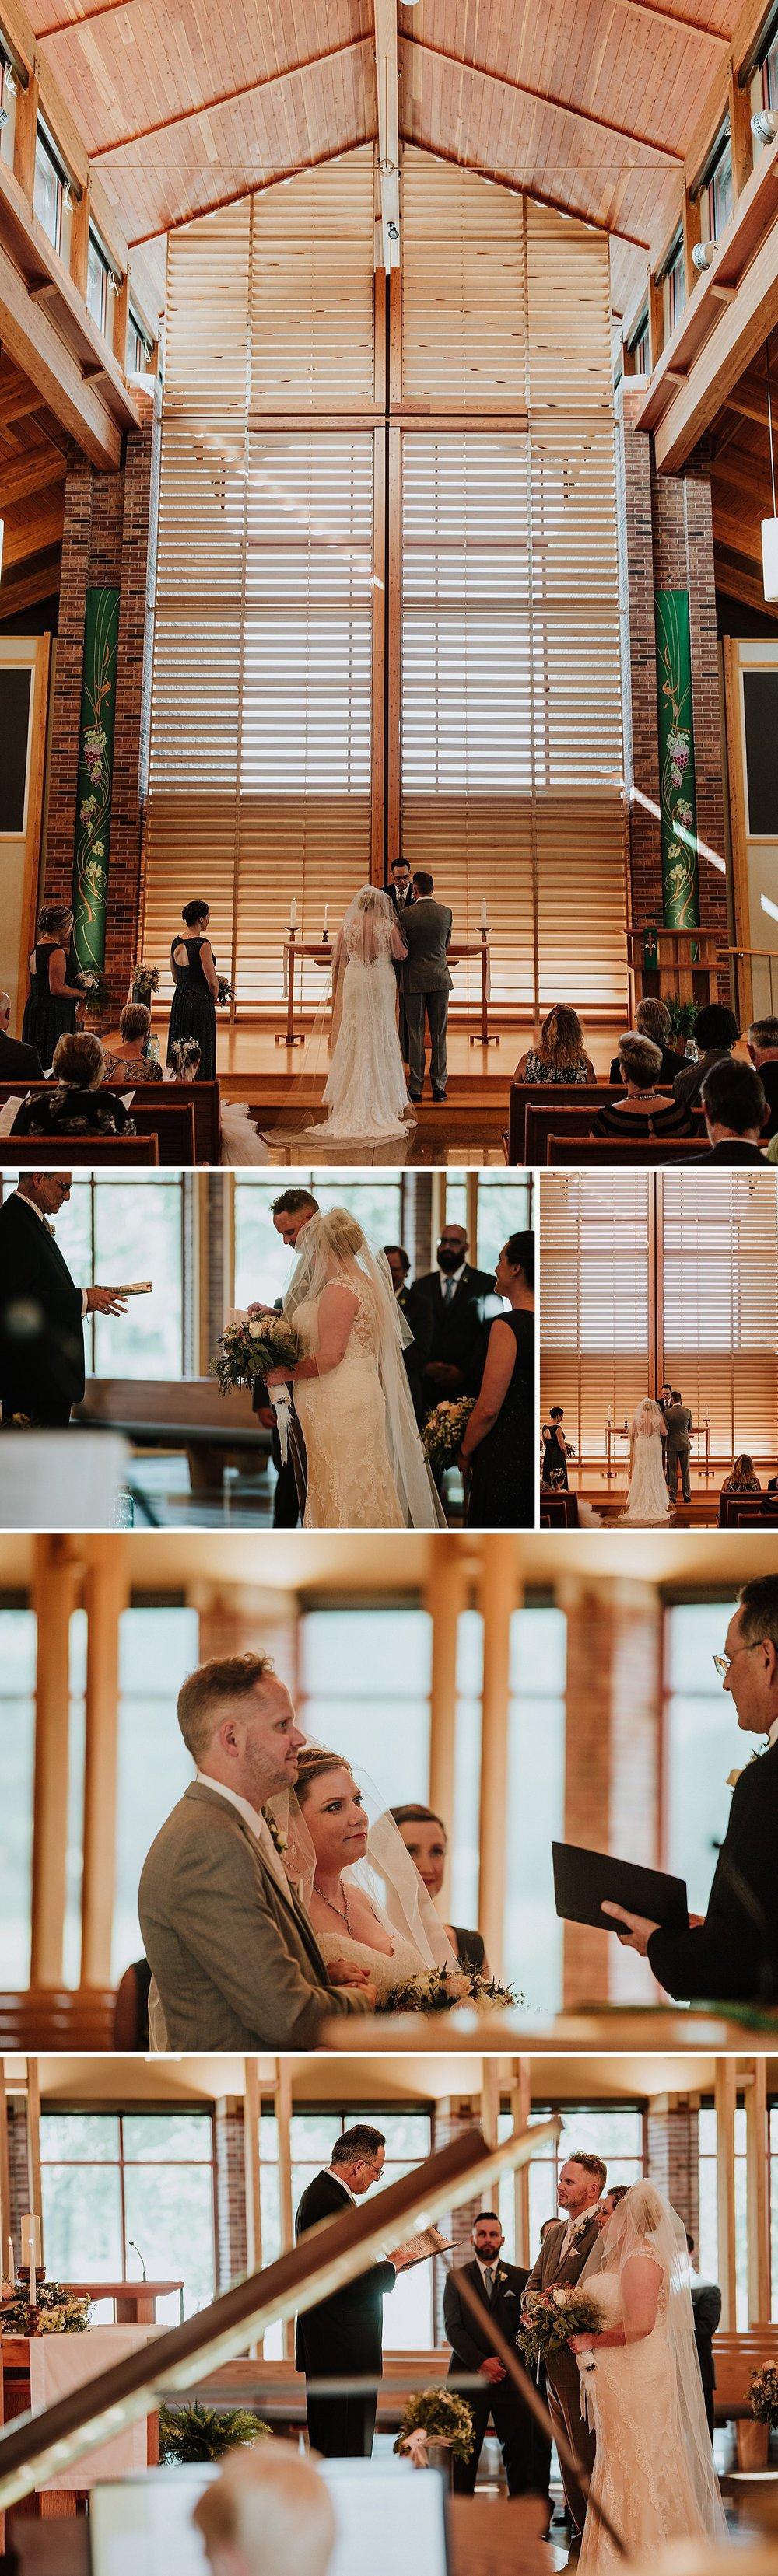 Terrace-167-Documentary-Wedding-Photographer_0010.jpg